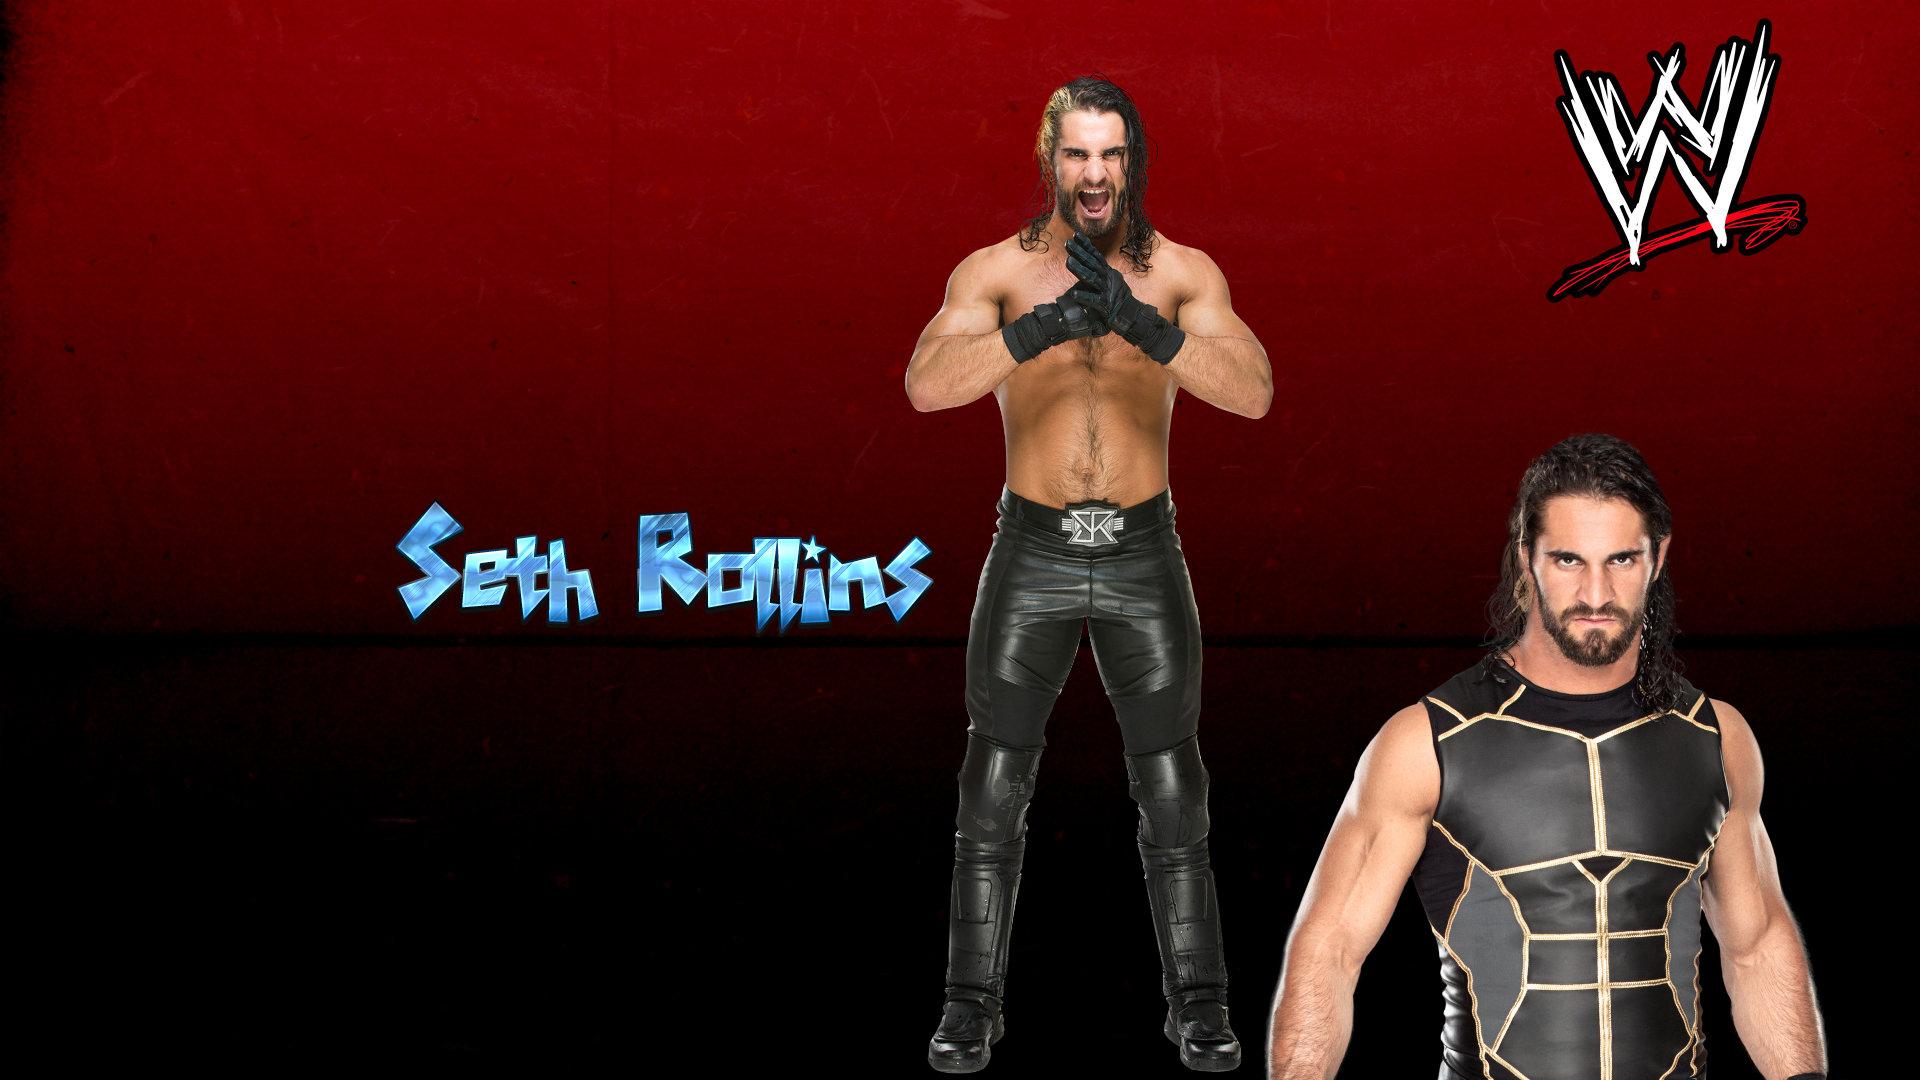 WWE Superstar Wrestler Seth Rollins HD Wallpapers 2016 1920x1080